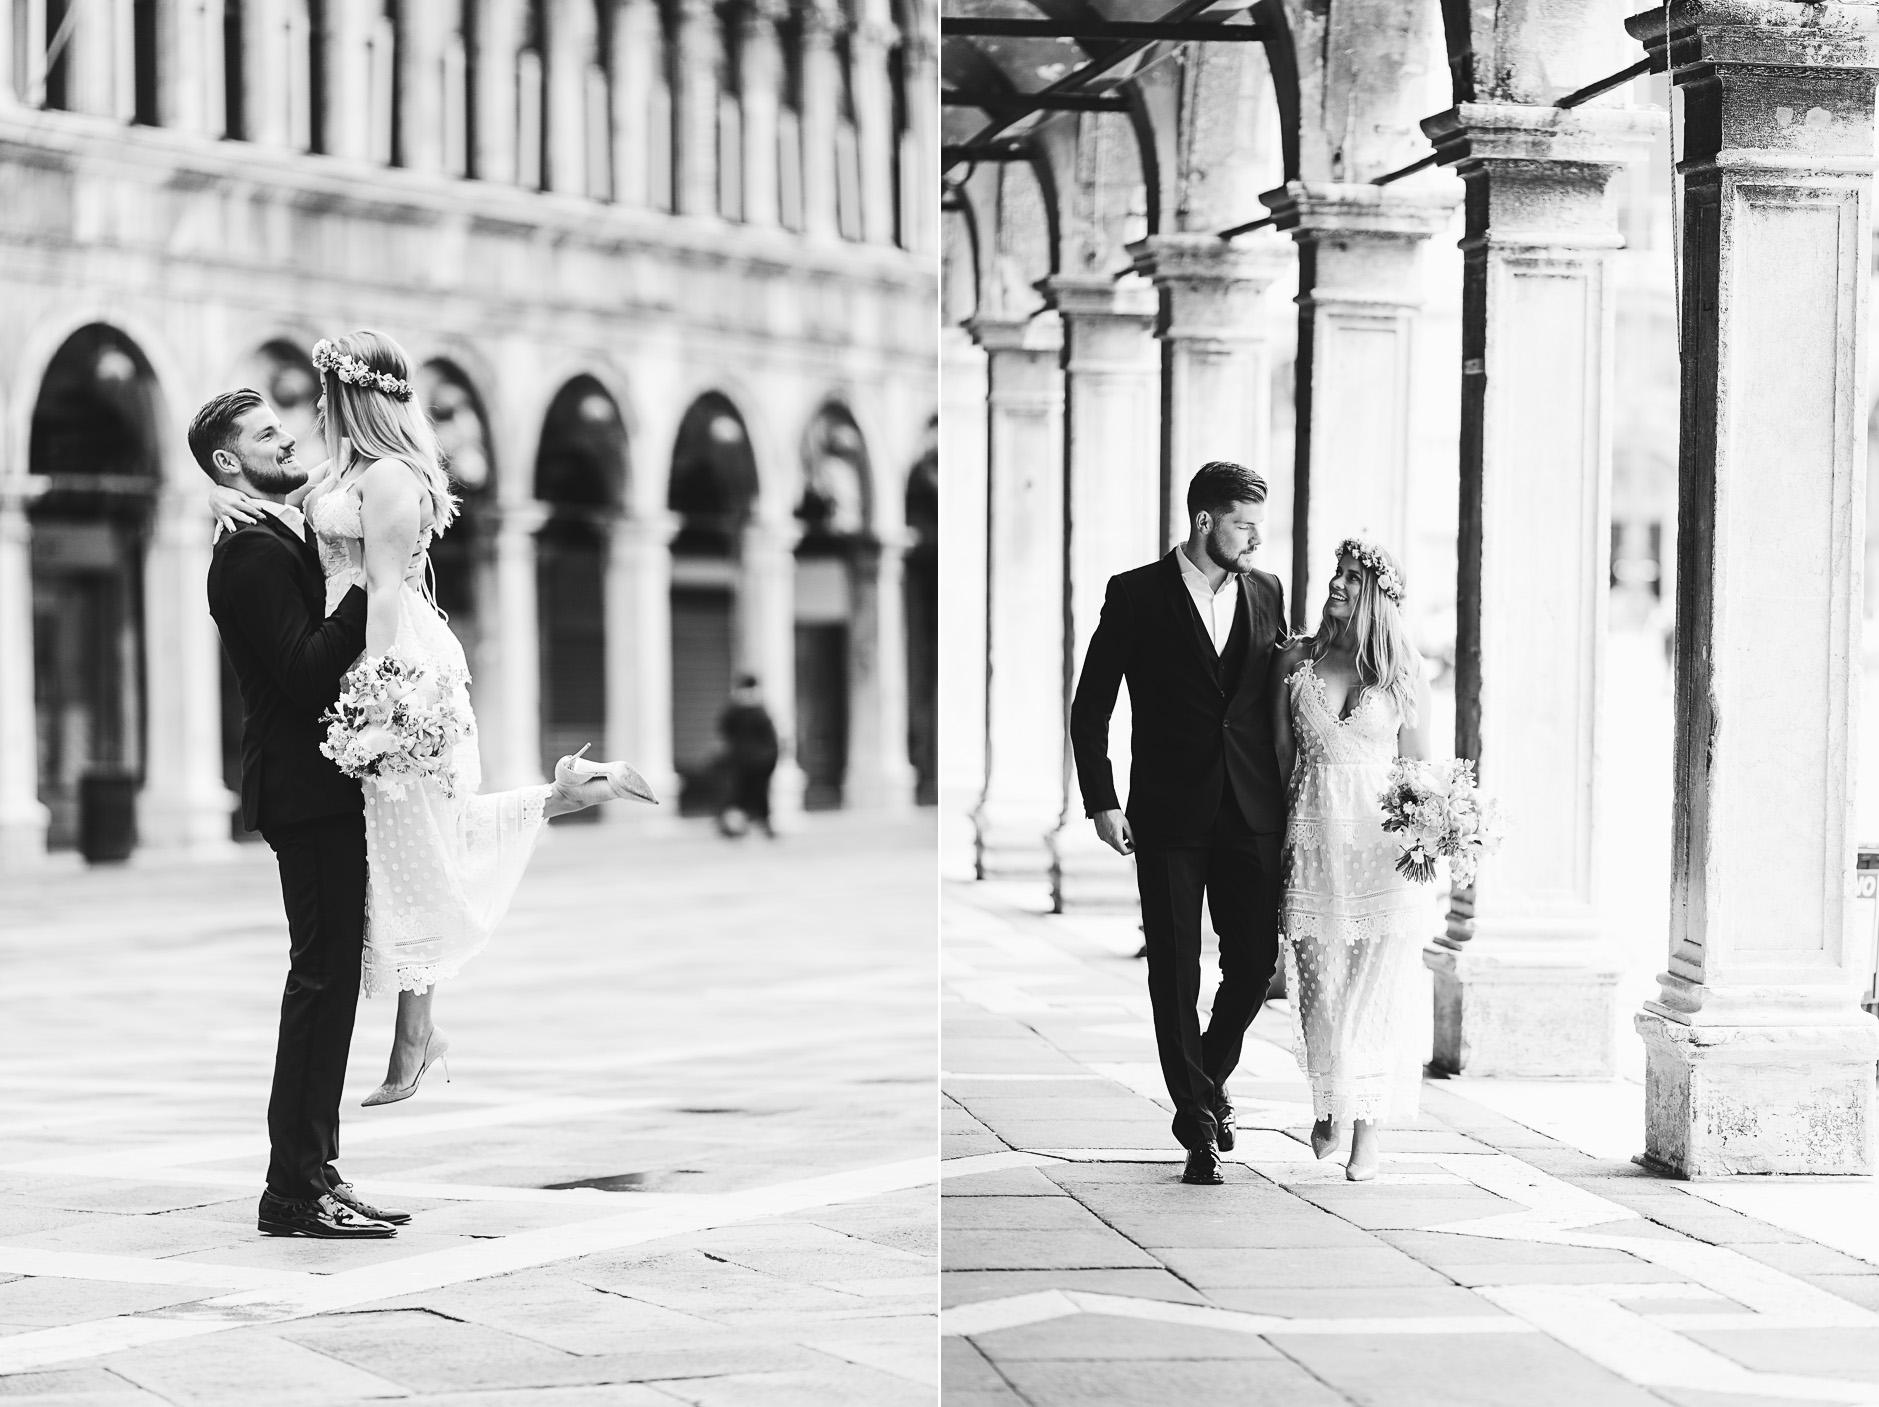 Hochzeitsfotograf Le Hai Linh Boho Chic After Wedding Shooting Venedig Timo Horn 1.FC Koeln 037.jpg